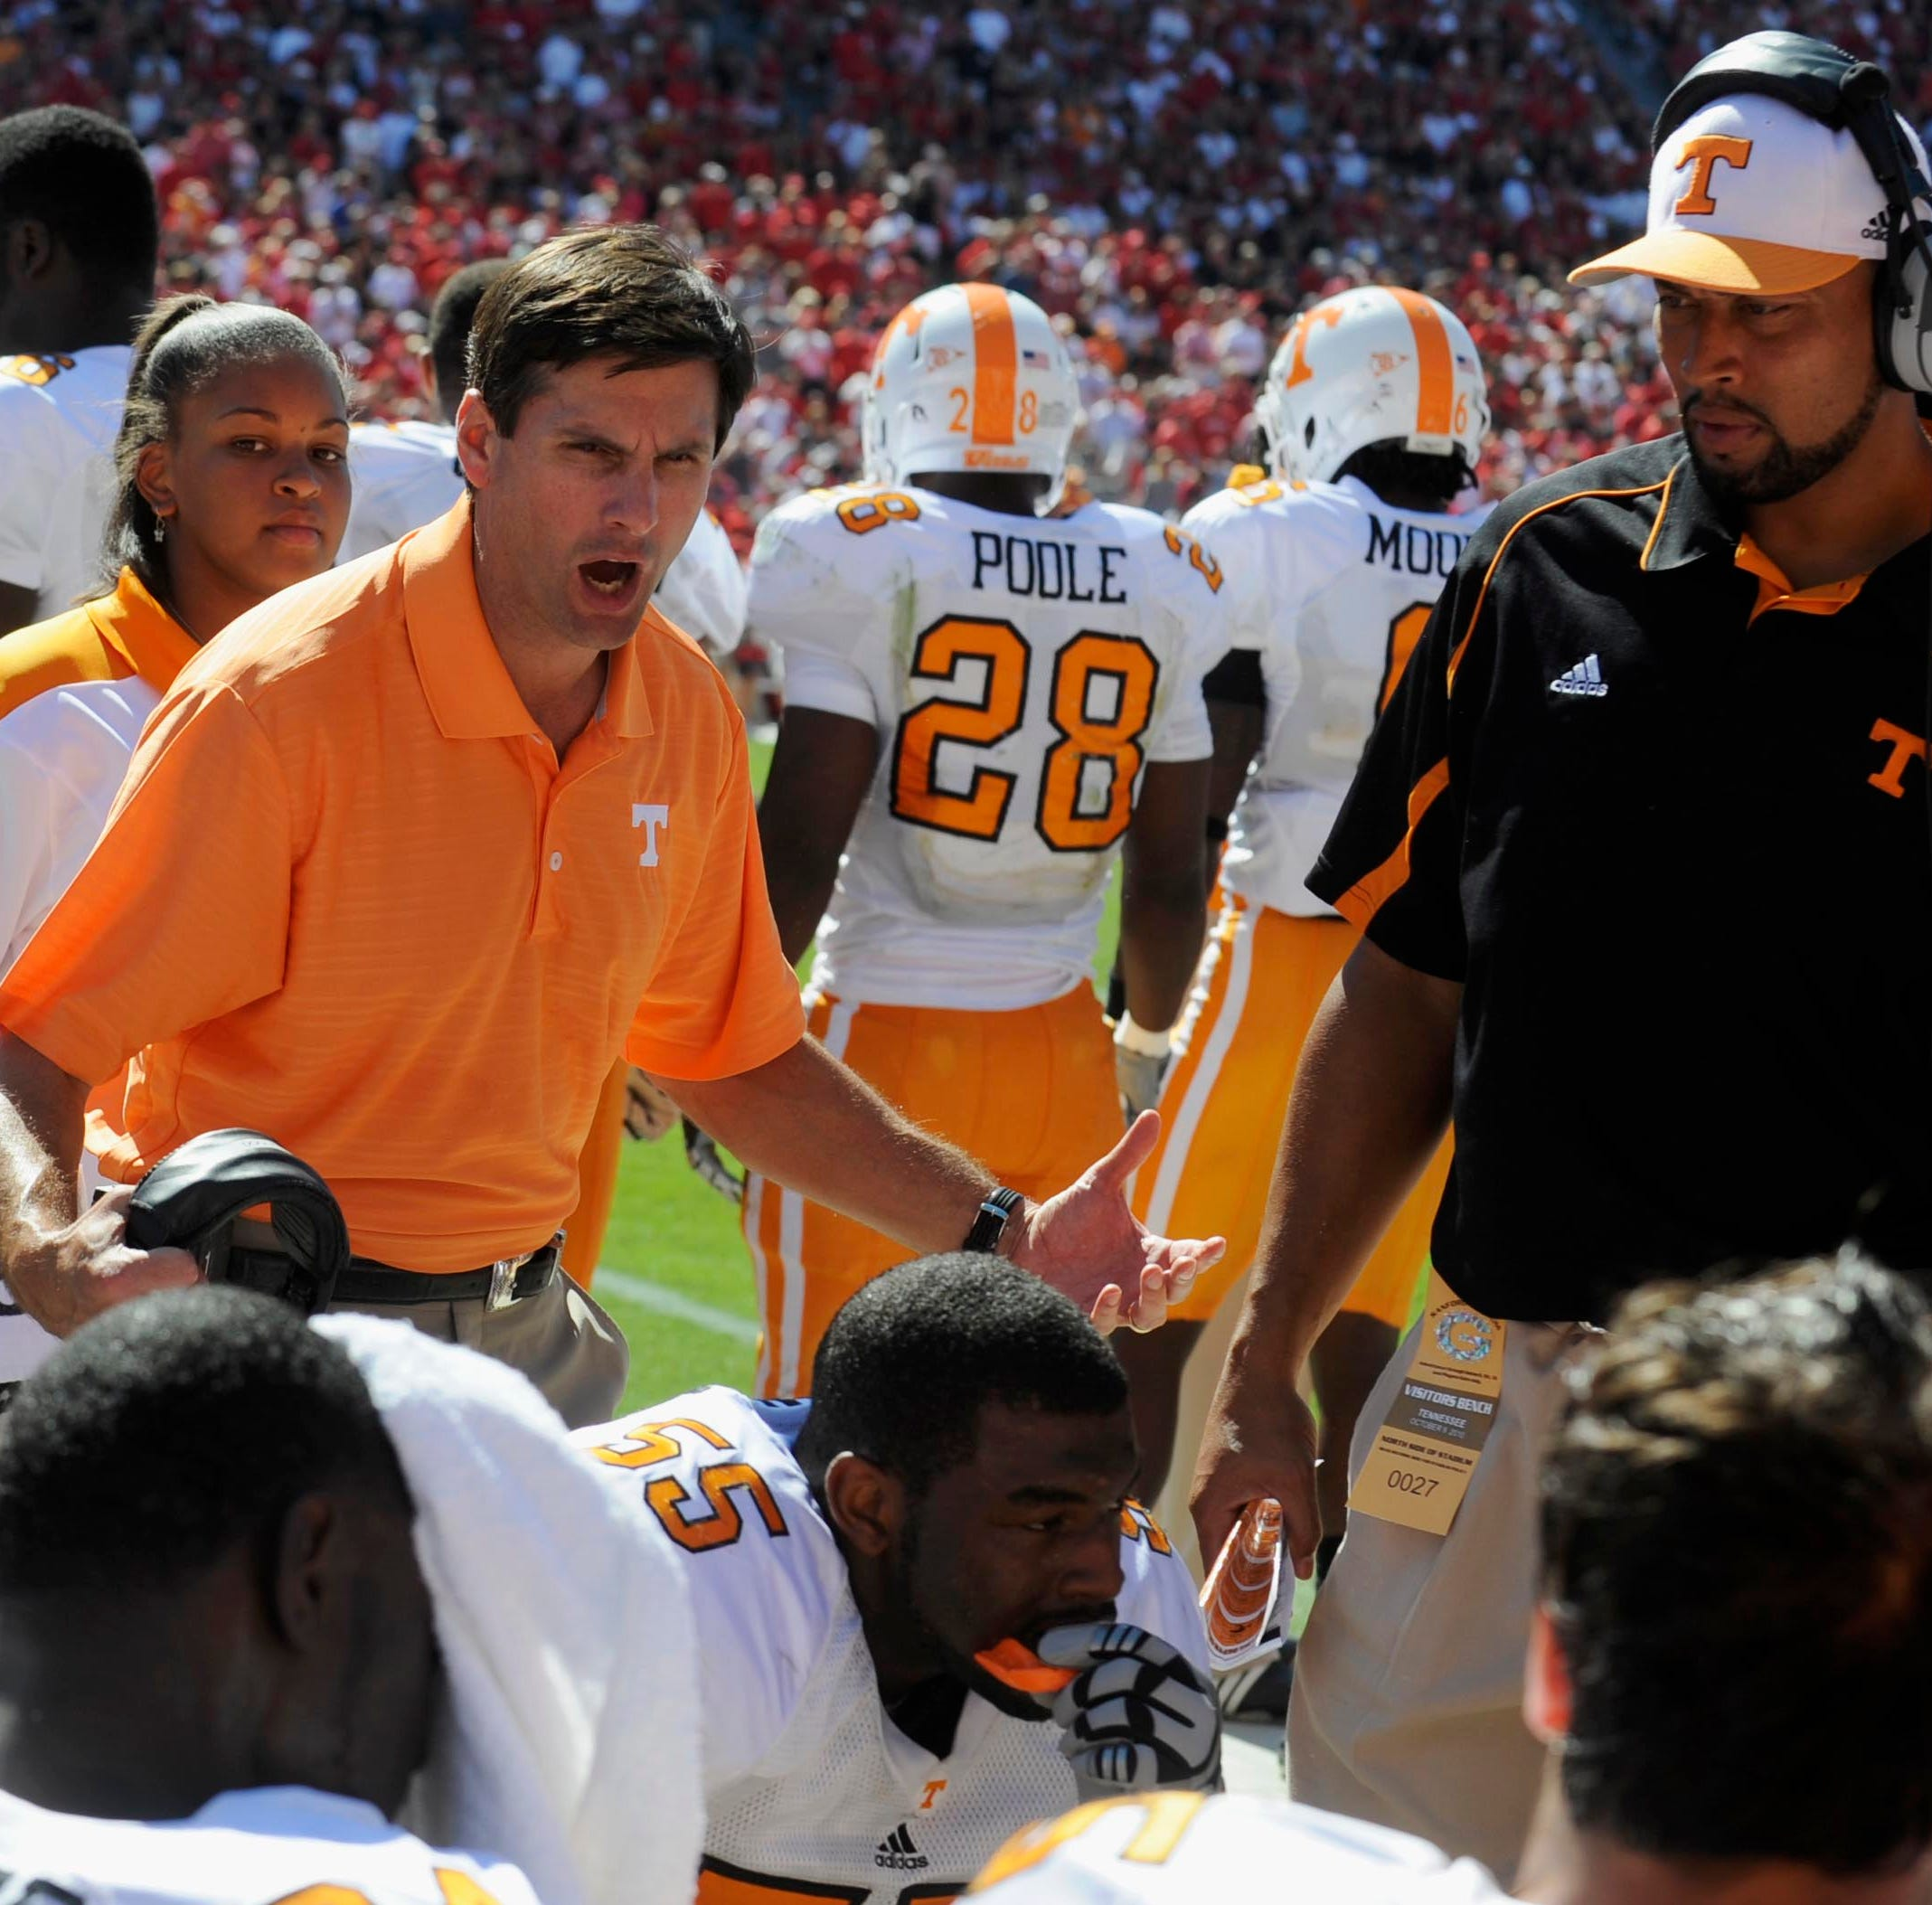 UT Vols football: How Derek Dooley's impact at Tennessee lasts through VFL program